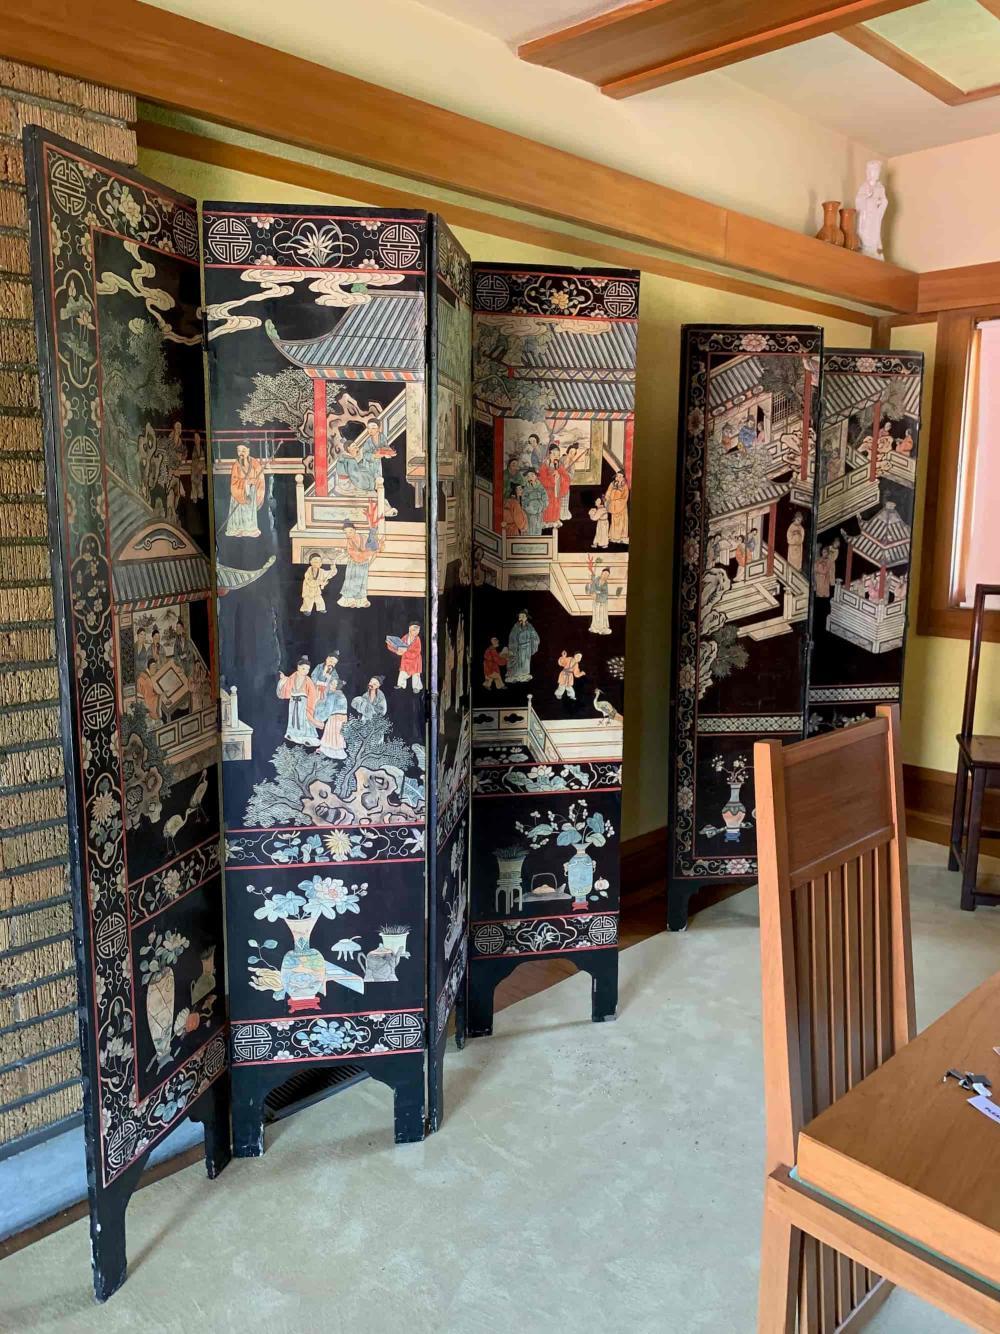 Original Coromandel Screen at Frank Lloyd Wright's Allen House